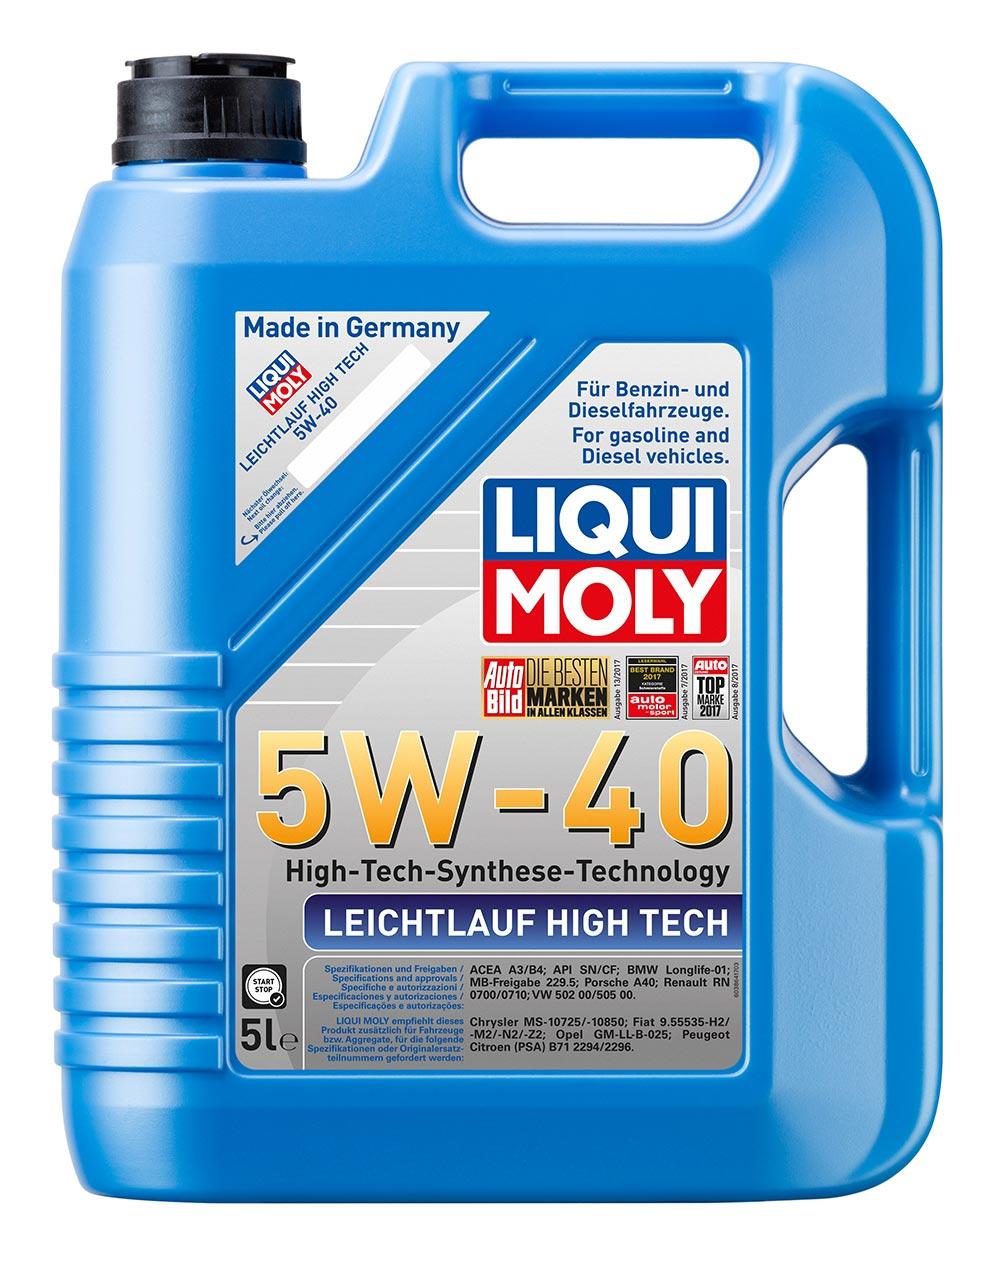 Масло моторное синт.5W40 Leichtlauf High Tech 5л API SN/CF.ACEA A3-04.B4-04.C3-0